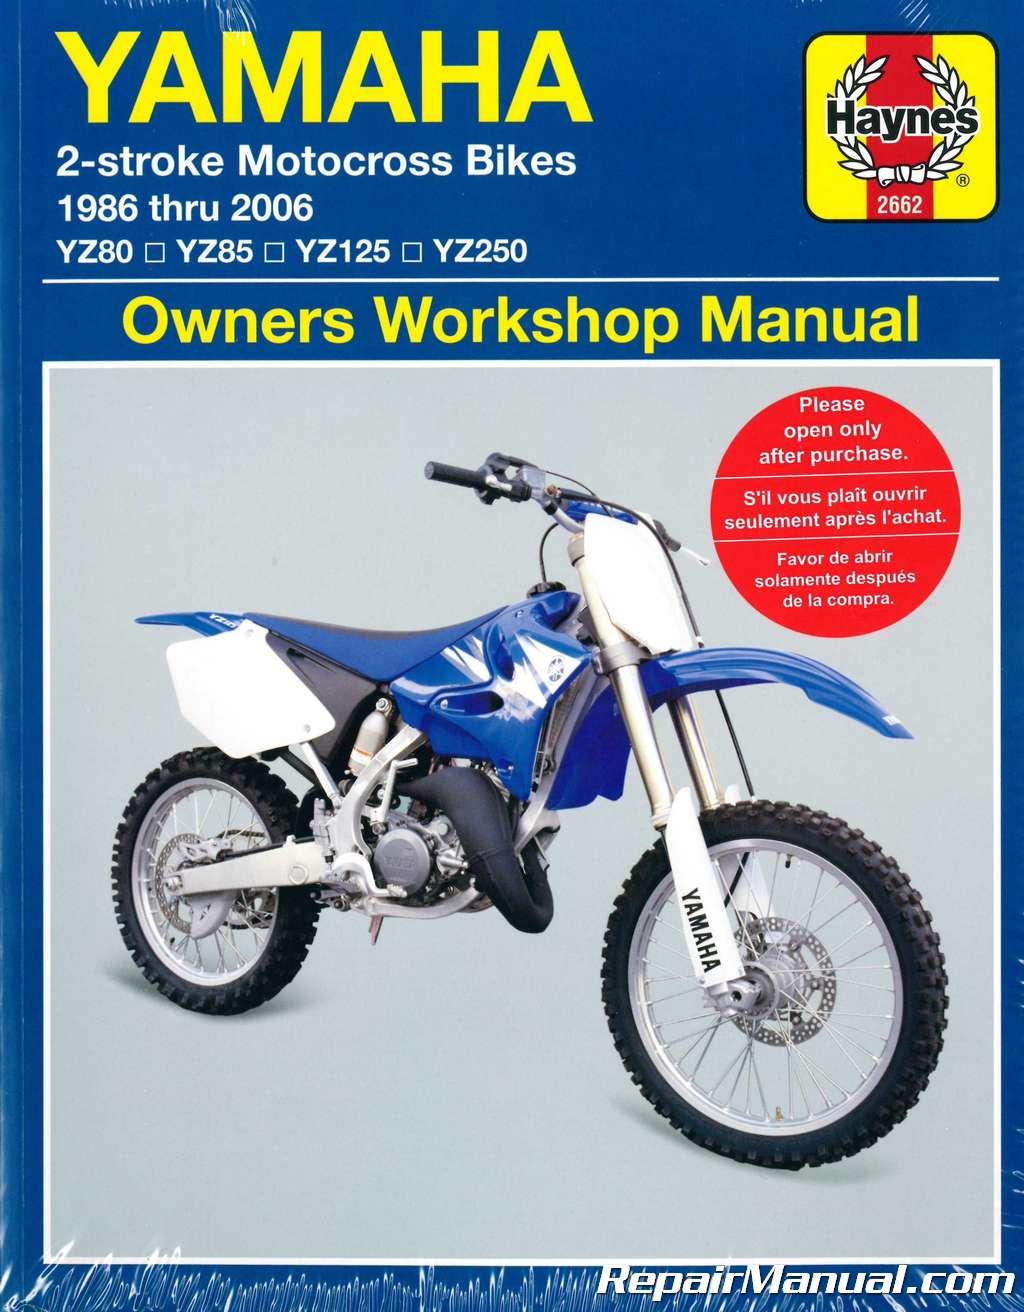 1986 2006 Yamaha Yz80 Yz85 Yz125 Yz250 Two Stroke Motorcycle Repair Manual